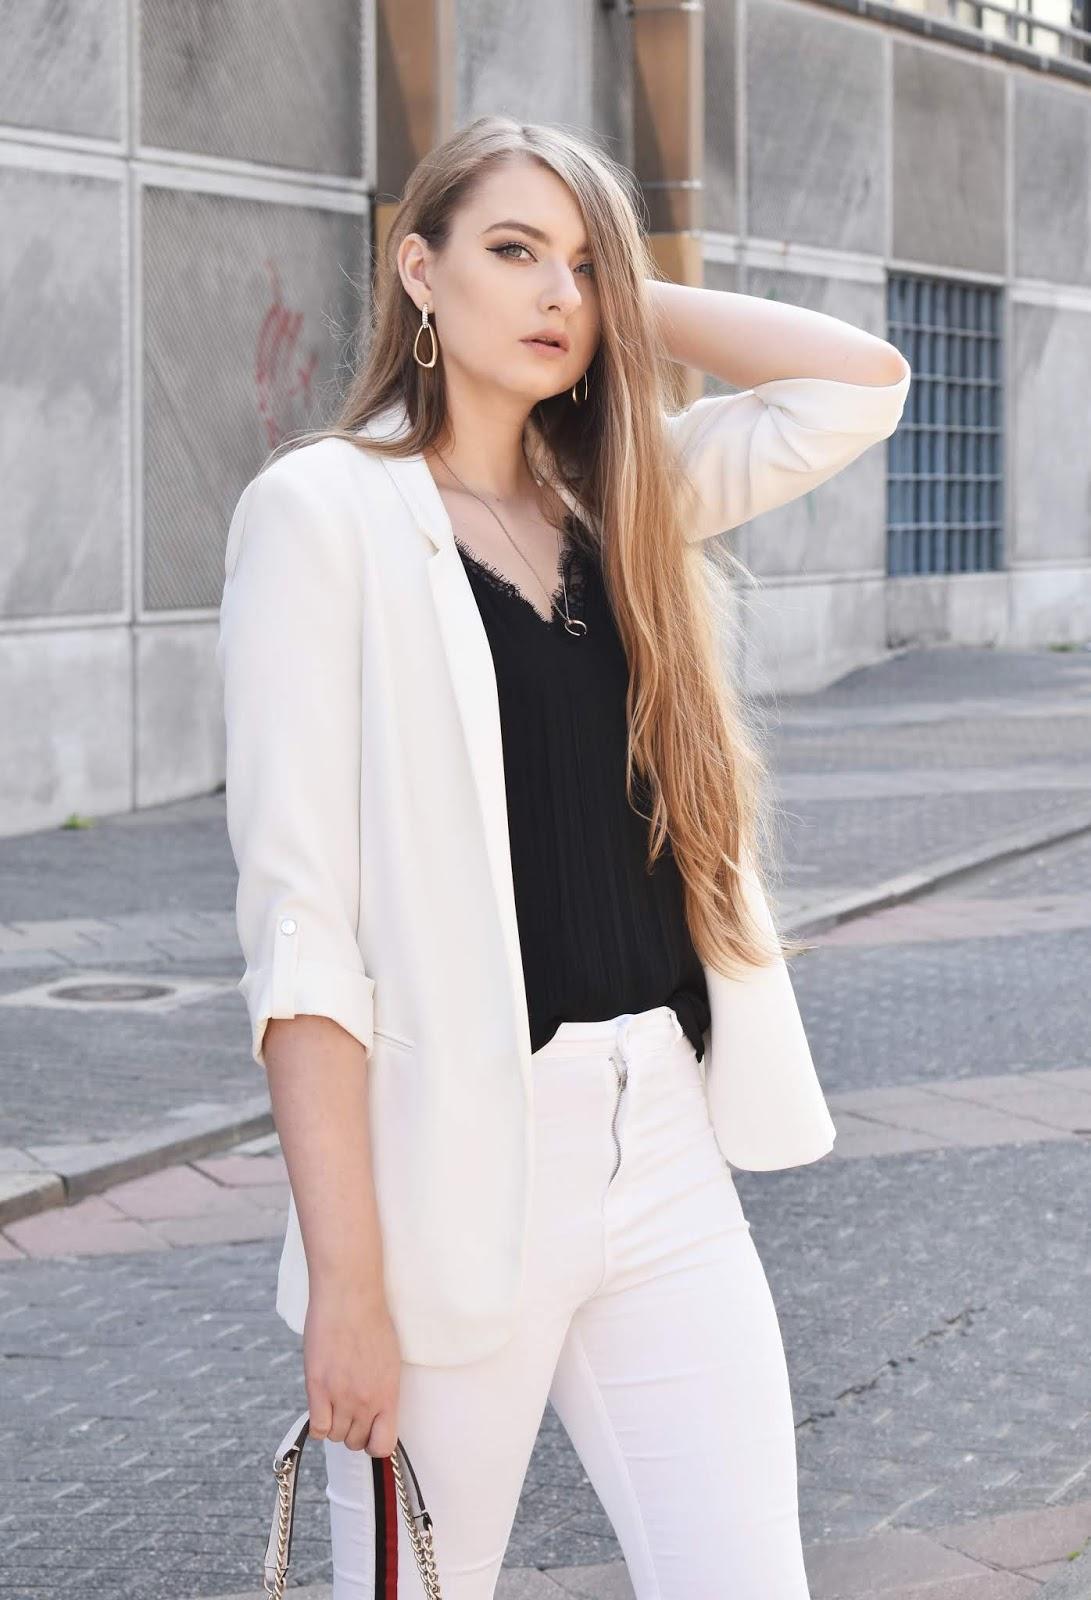 Białe jeansy - jak je nosić